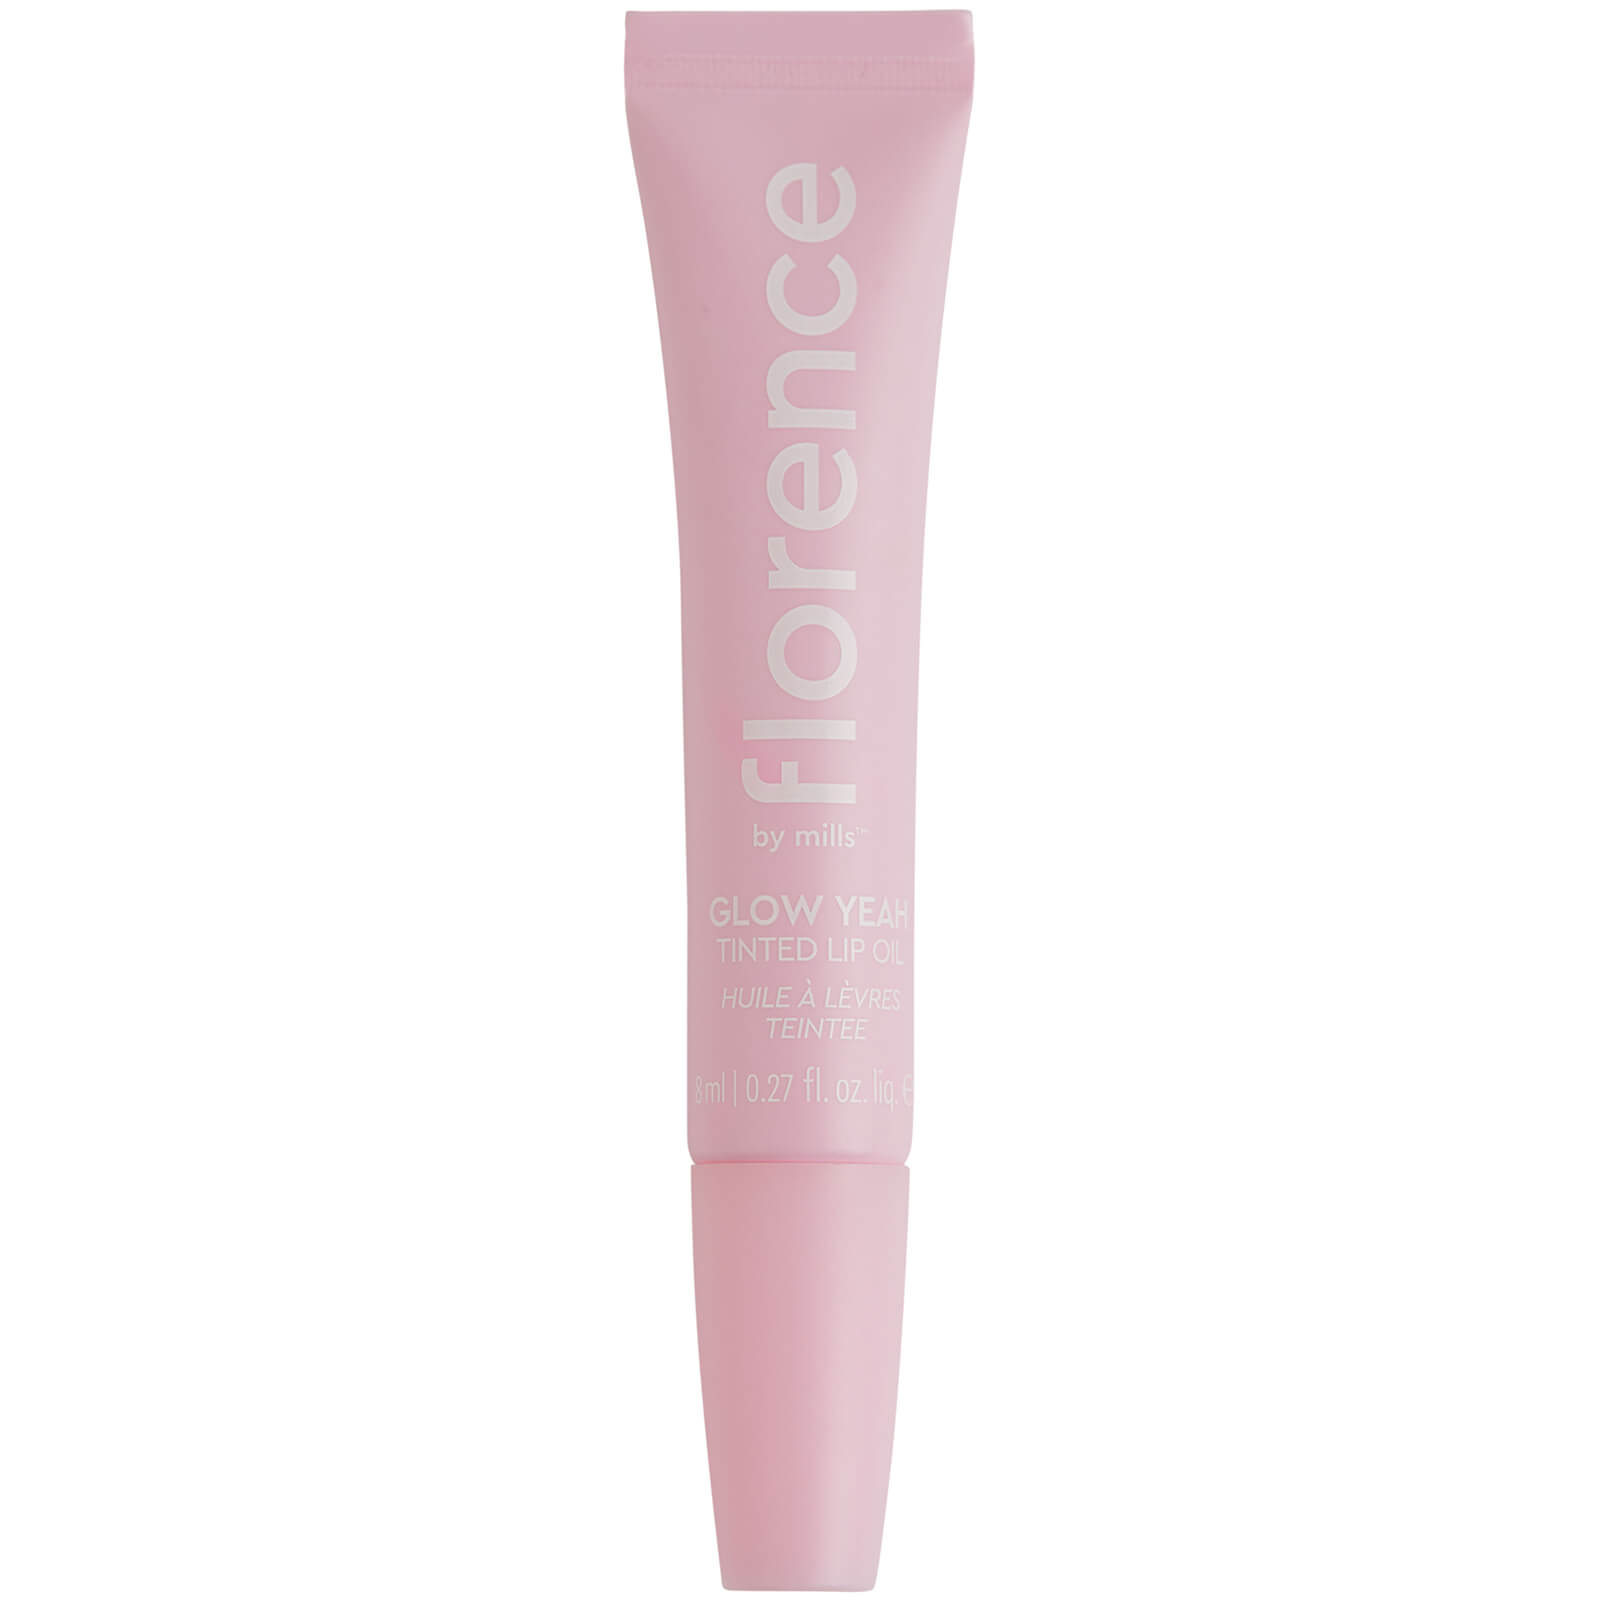 Купить Florence by Mills Glow Yeah Tinted Lip Oil